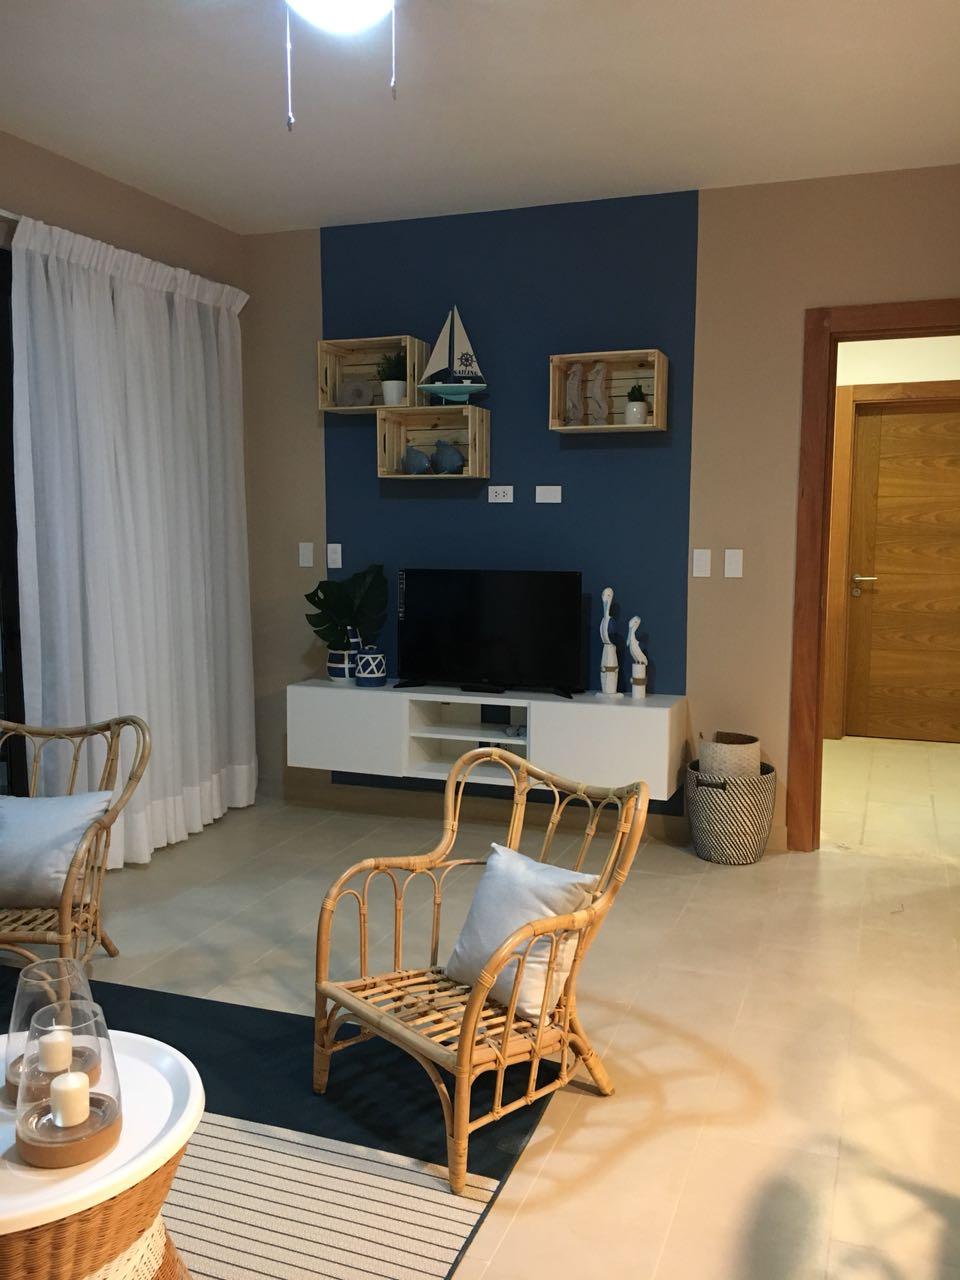 Exclusive 2 bedroom apartment in Las Terrenas5.jpeg